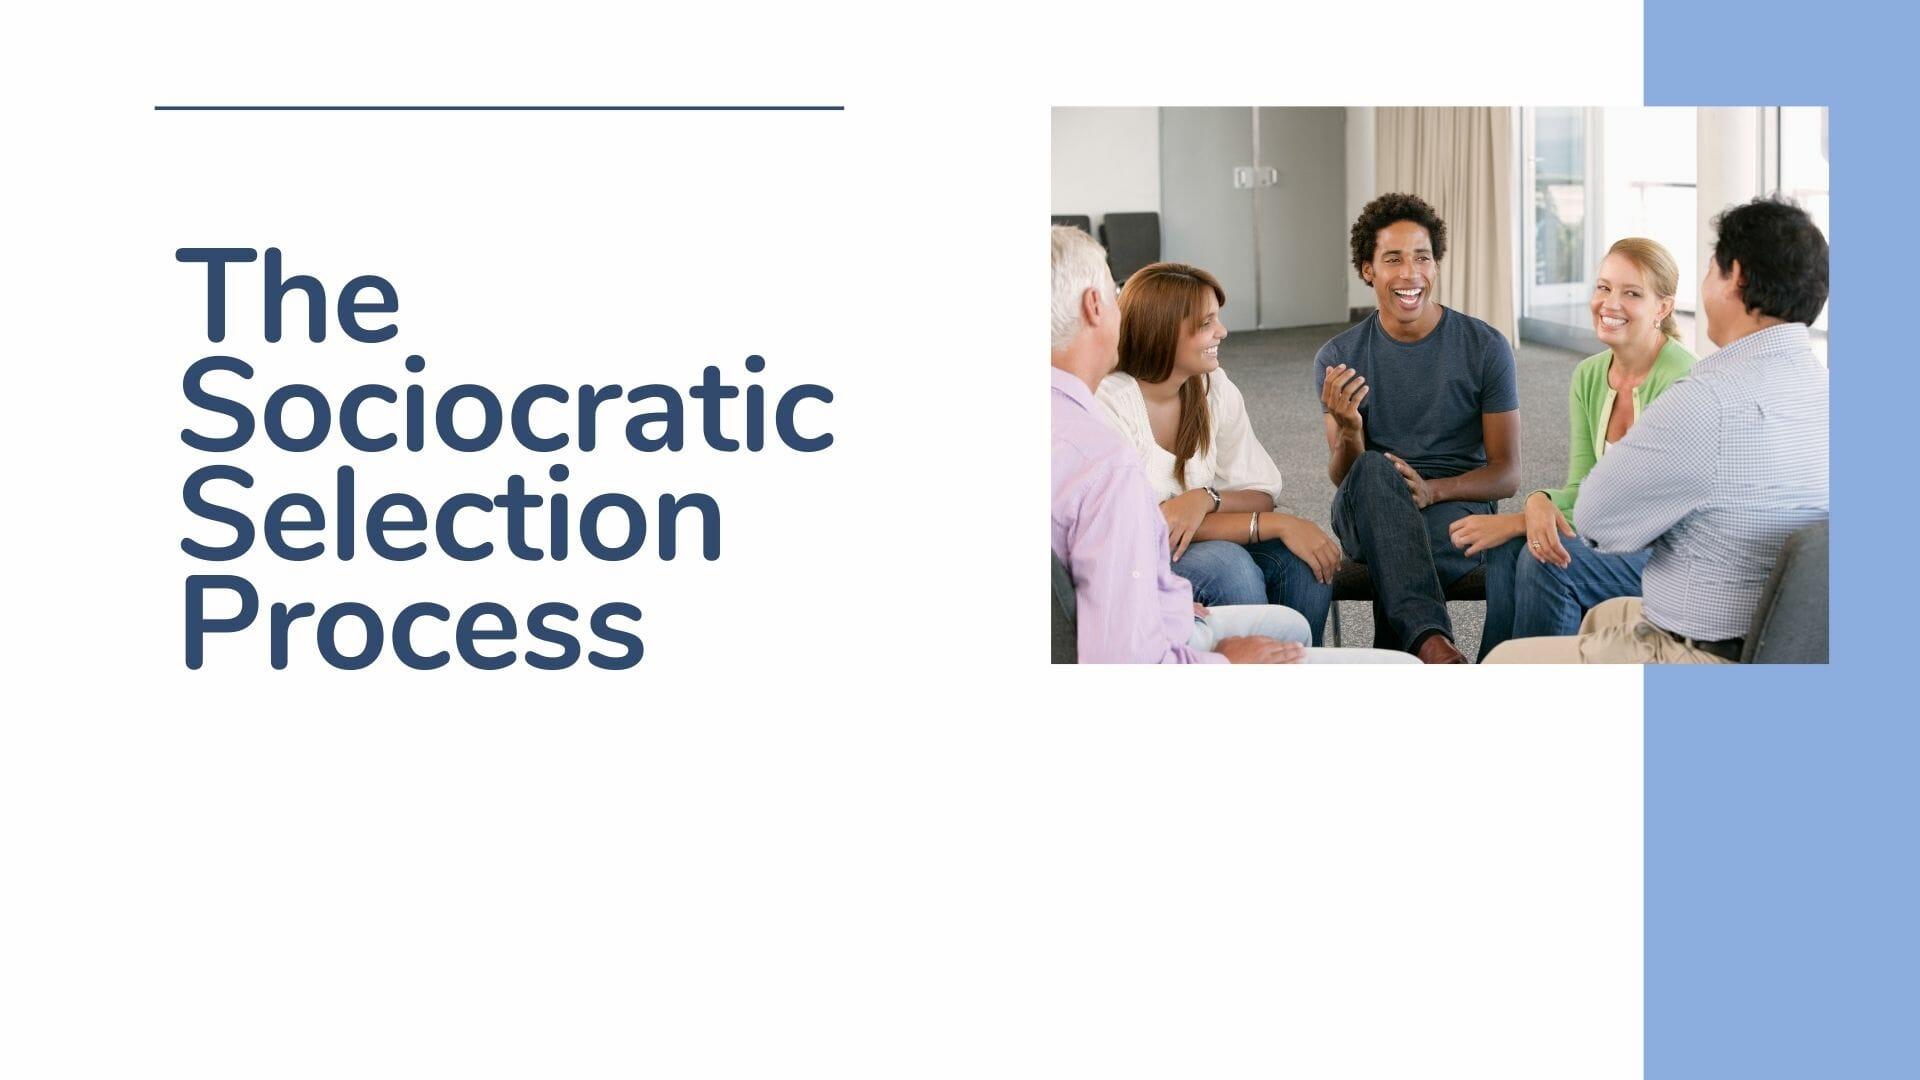 The Sociocratic Selection Process